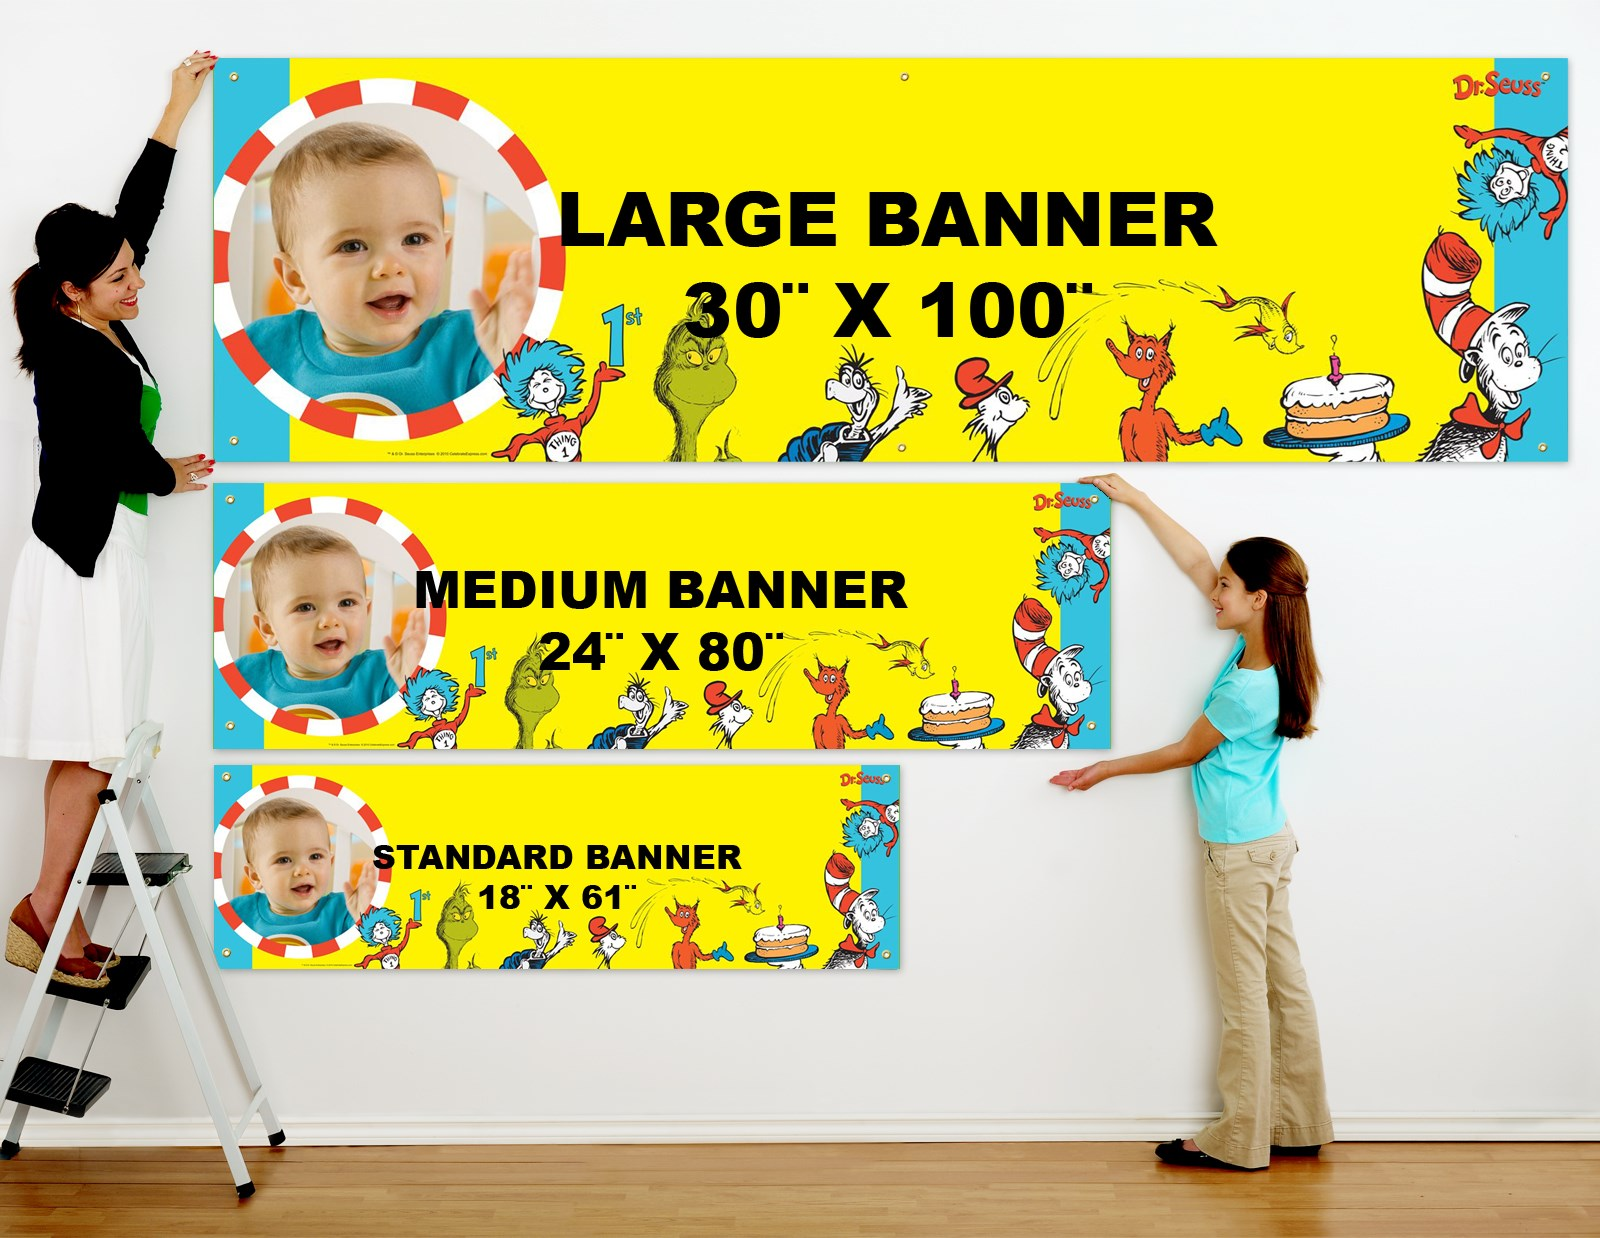 dr seuss personalized photo vinyl banner birthdayexpress com alt image 1 dr seuss personalized photo vinyl banner